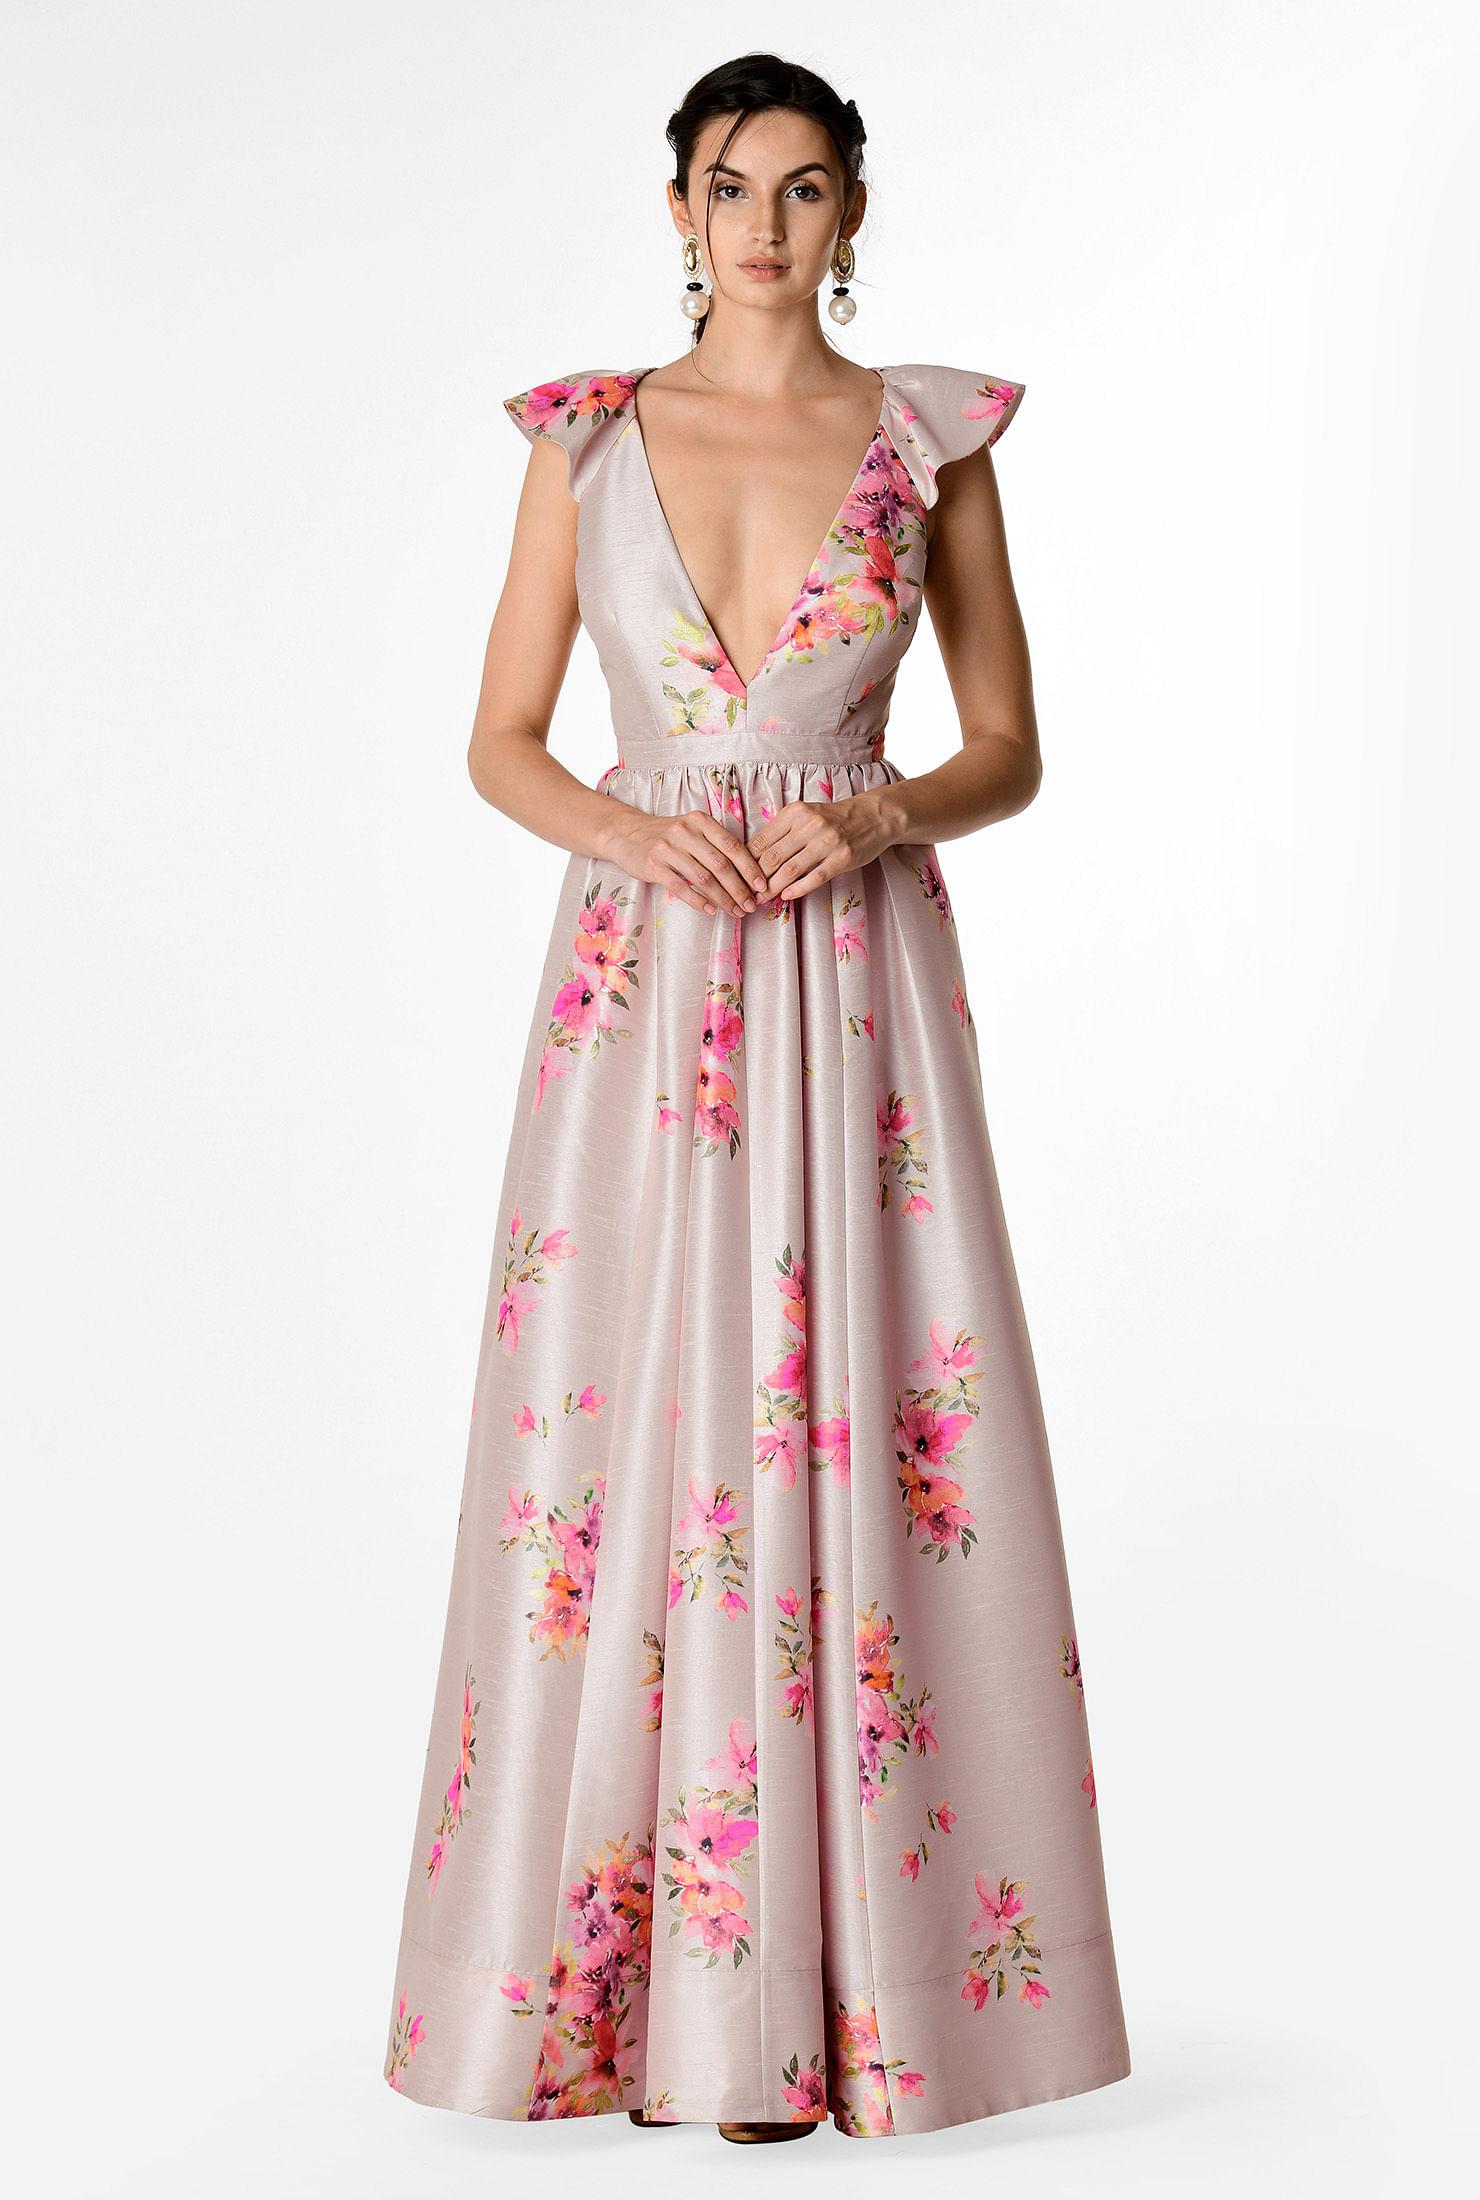 874385b0c72 Women s Fashion Clothing 0-36W and Custom